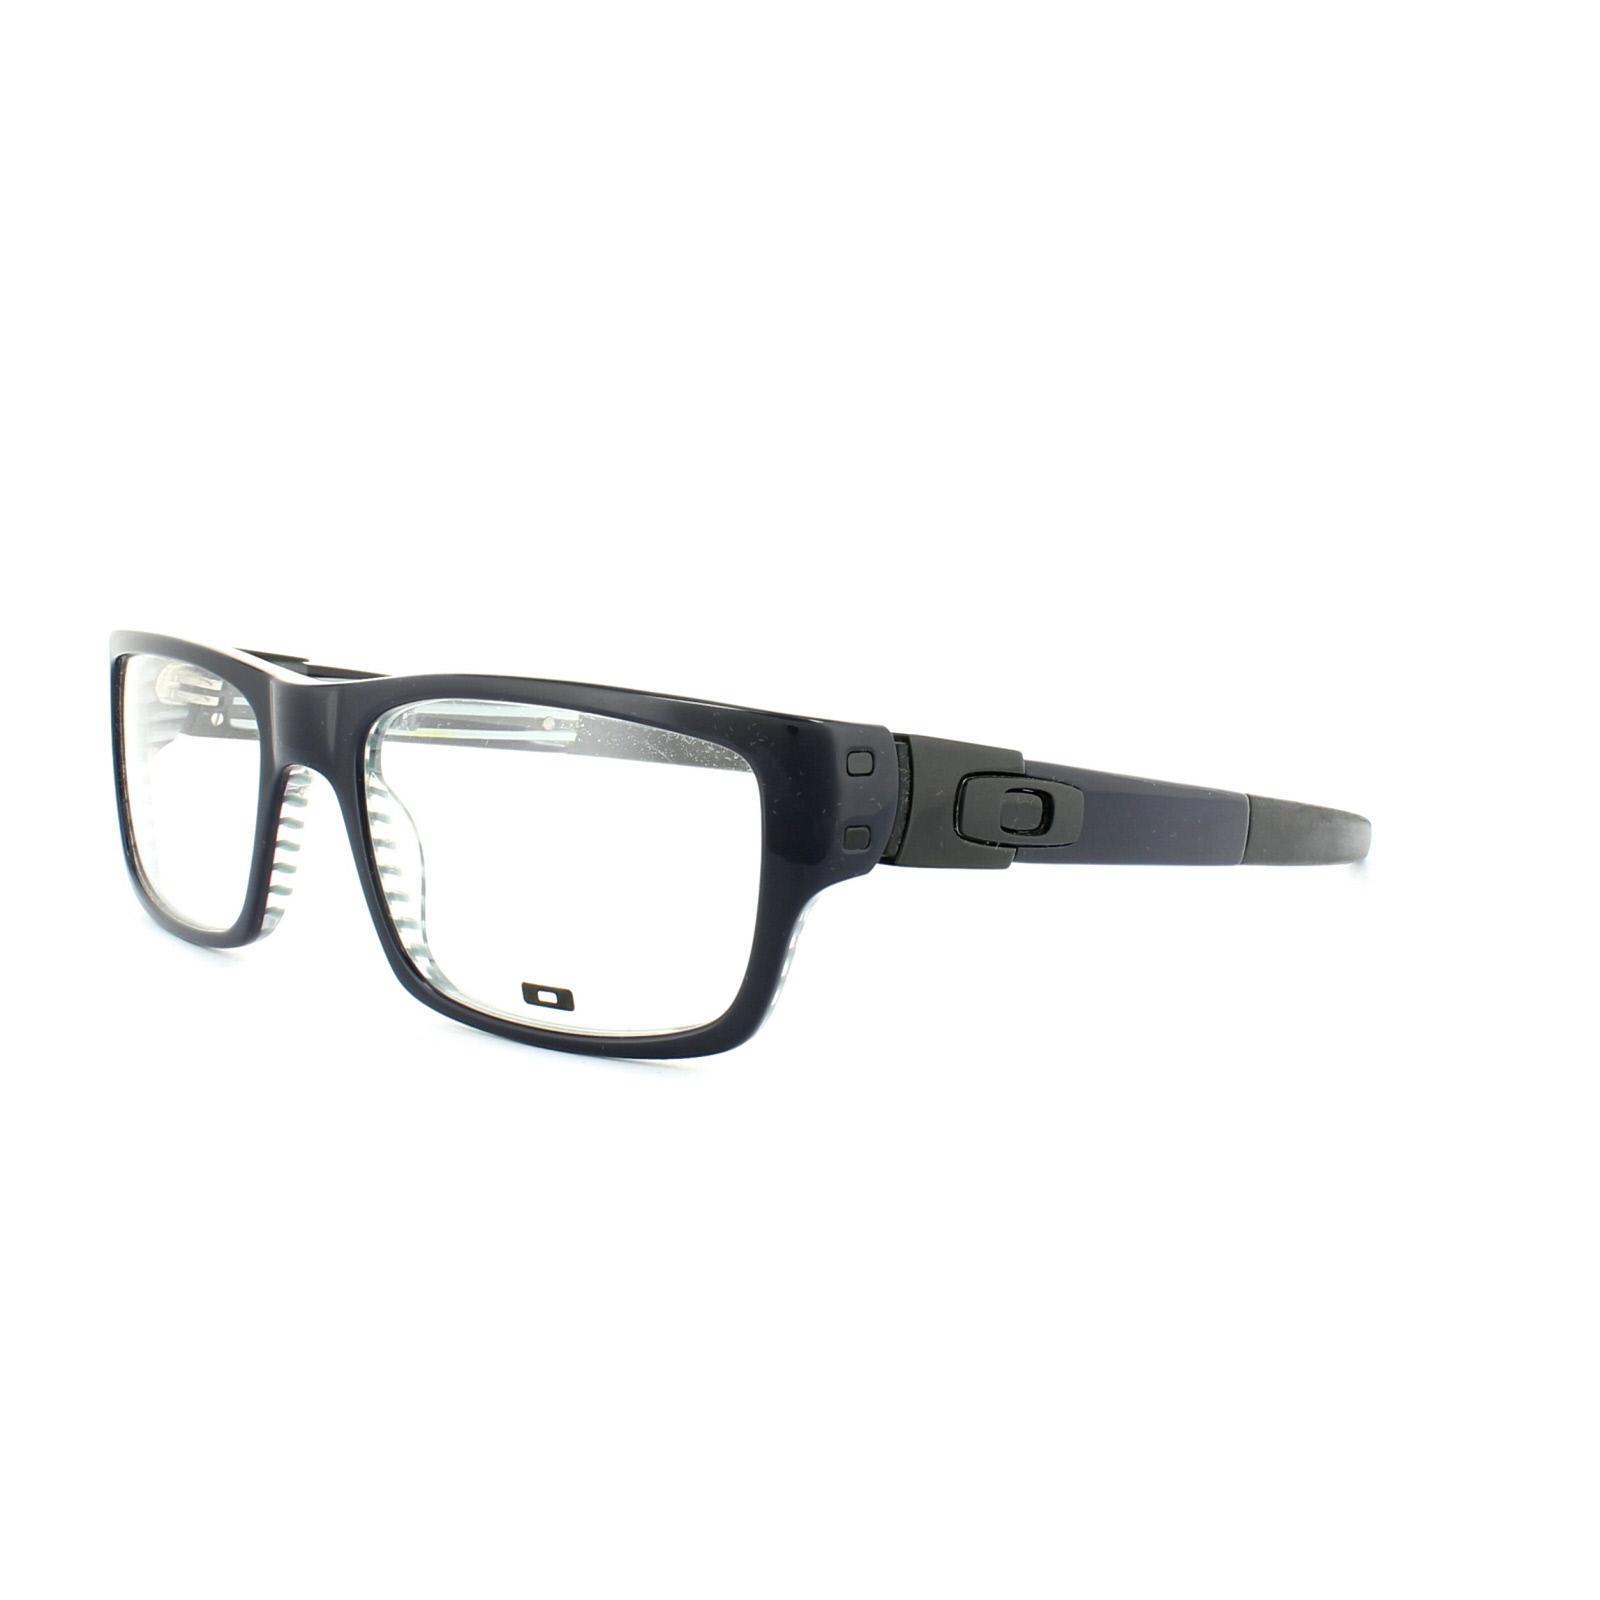 efb5afbaac6f Oakley Reading Glasses Frames Australia